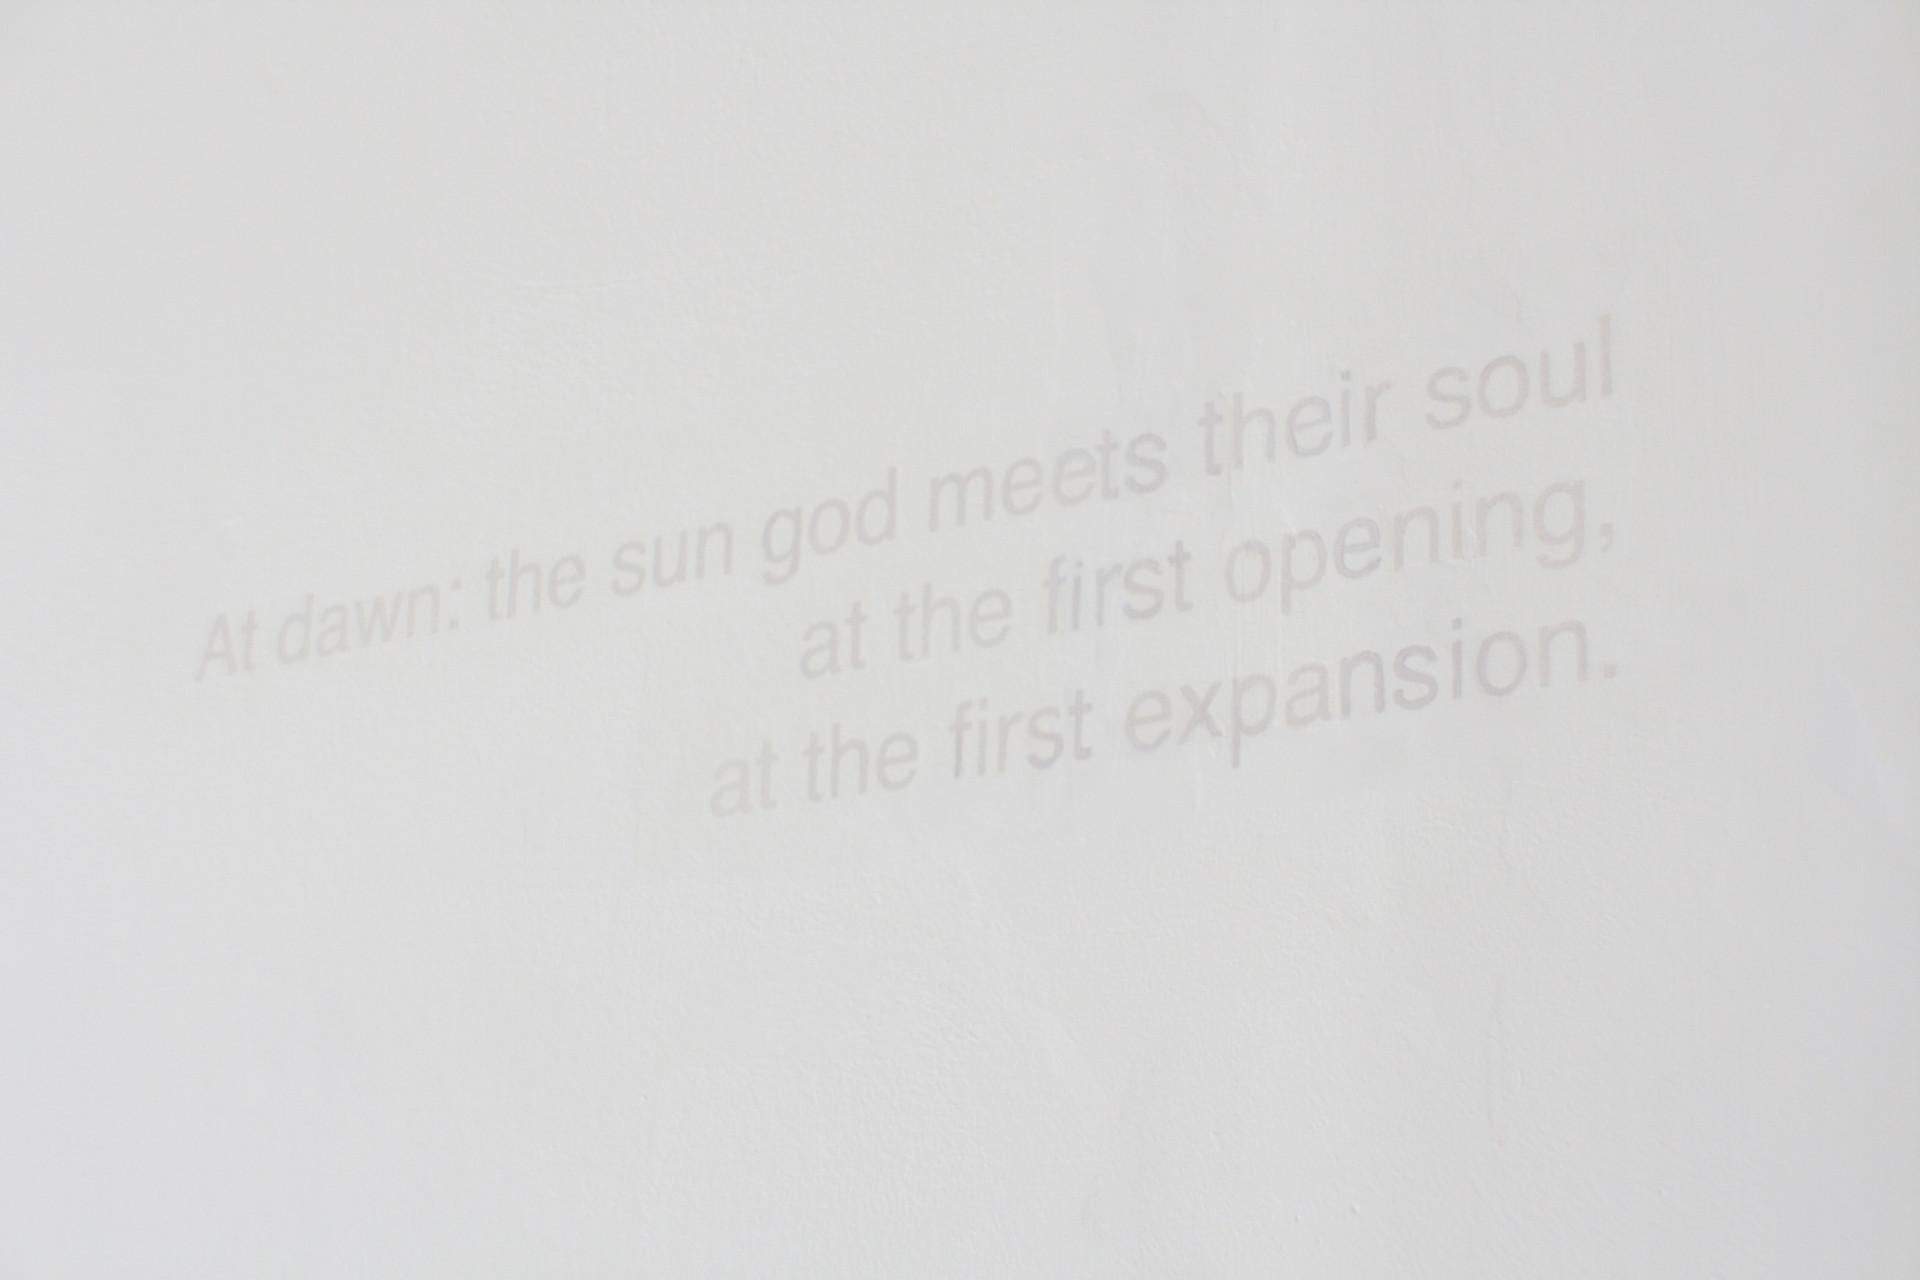 Marina Fathalla and Lamis Haggag, Dust-coloured skies, 2020.